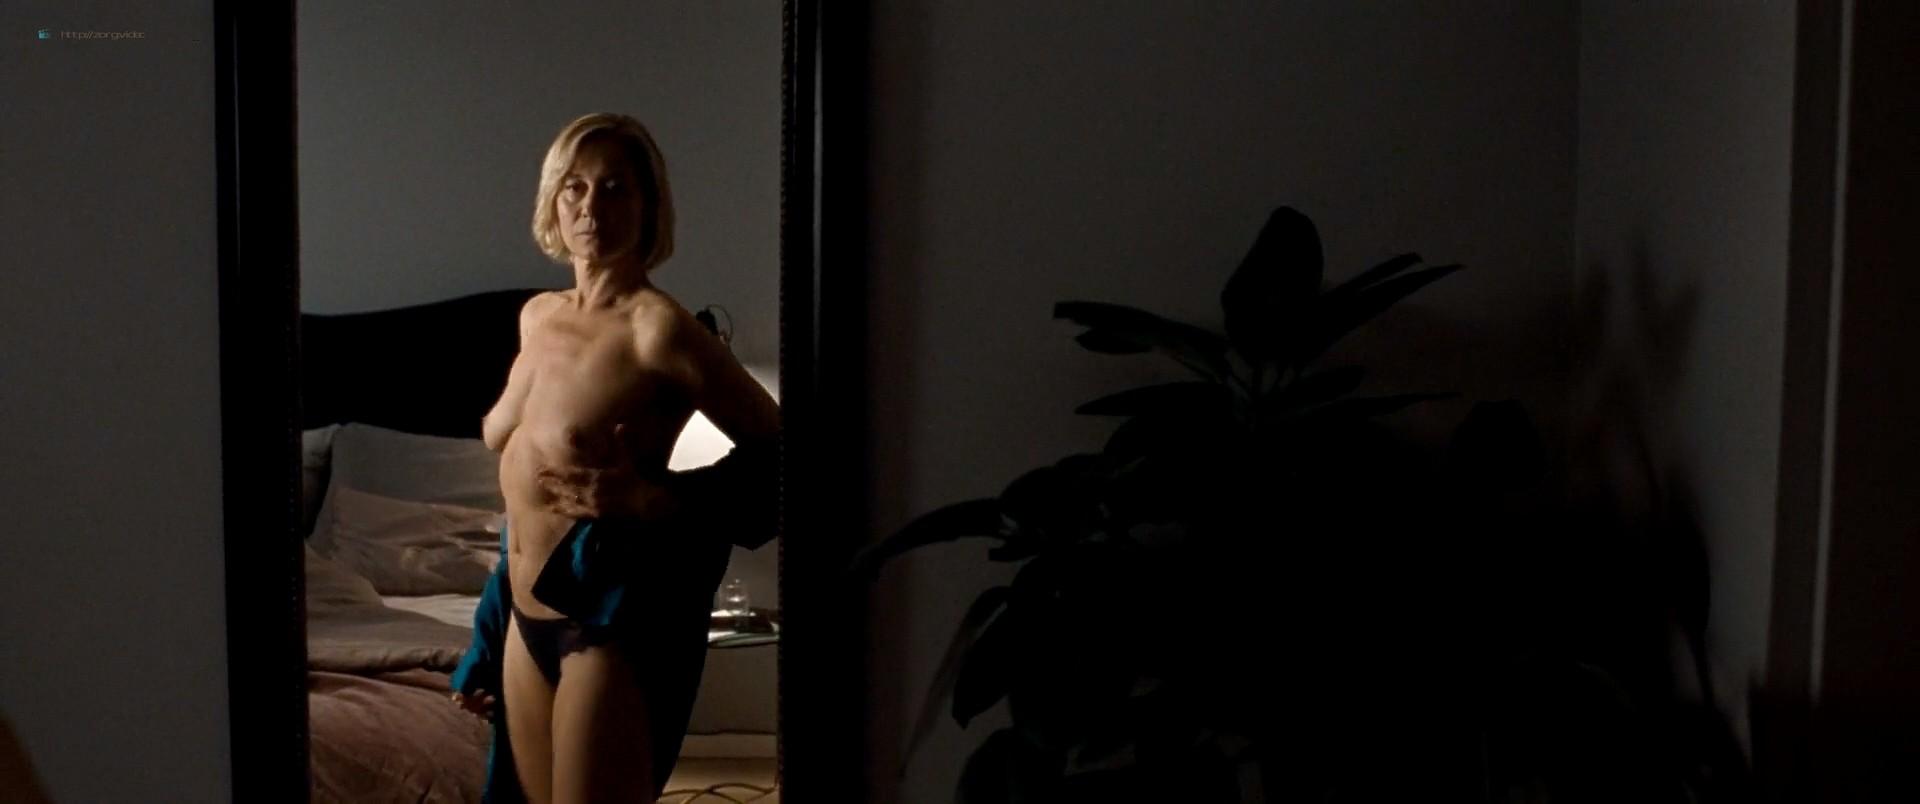 Trine Dyrholm nude explicit blow job and hot sex - Queen of Hearts (DK-2019) 1080p WEB (14)